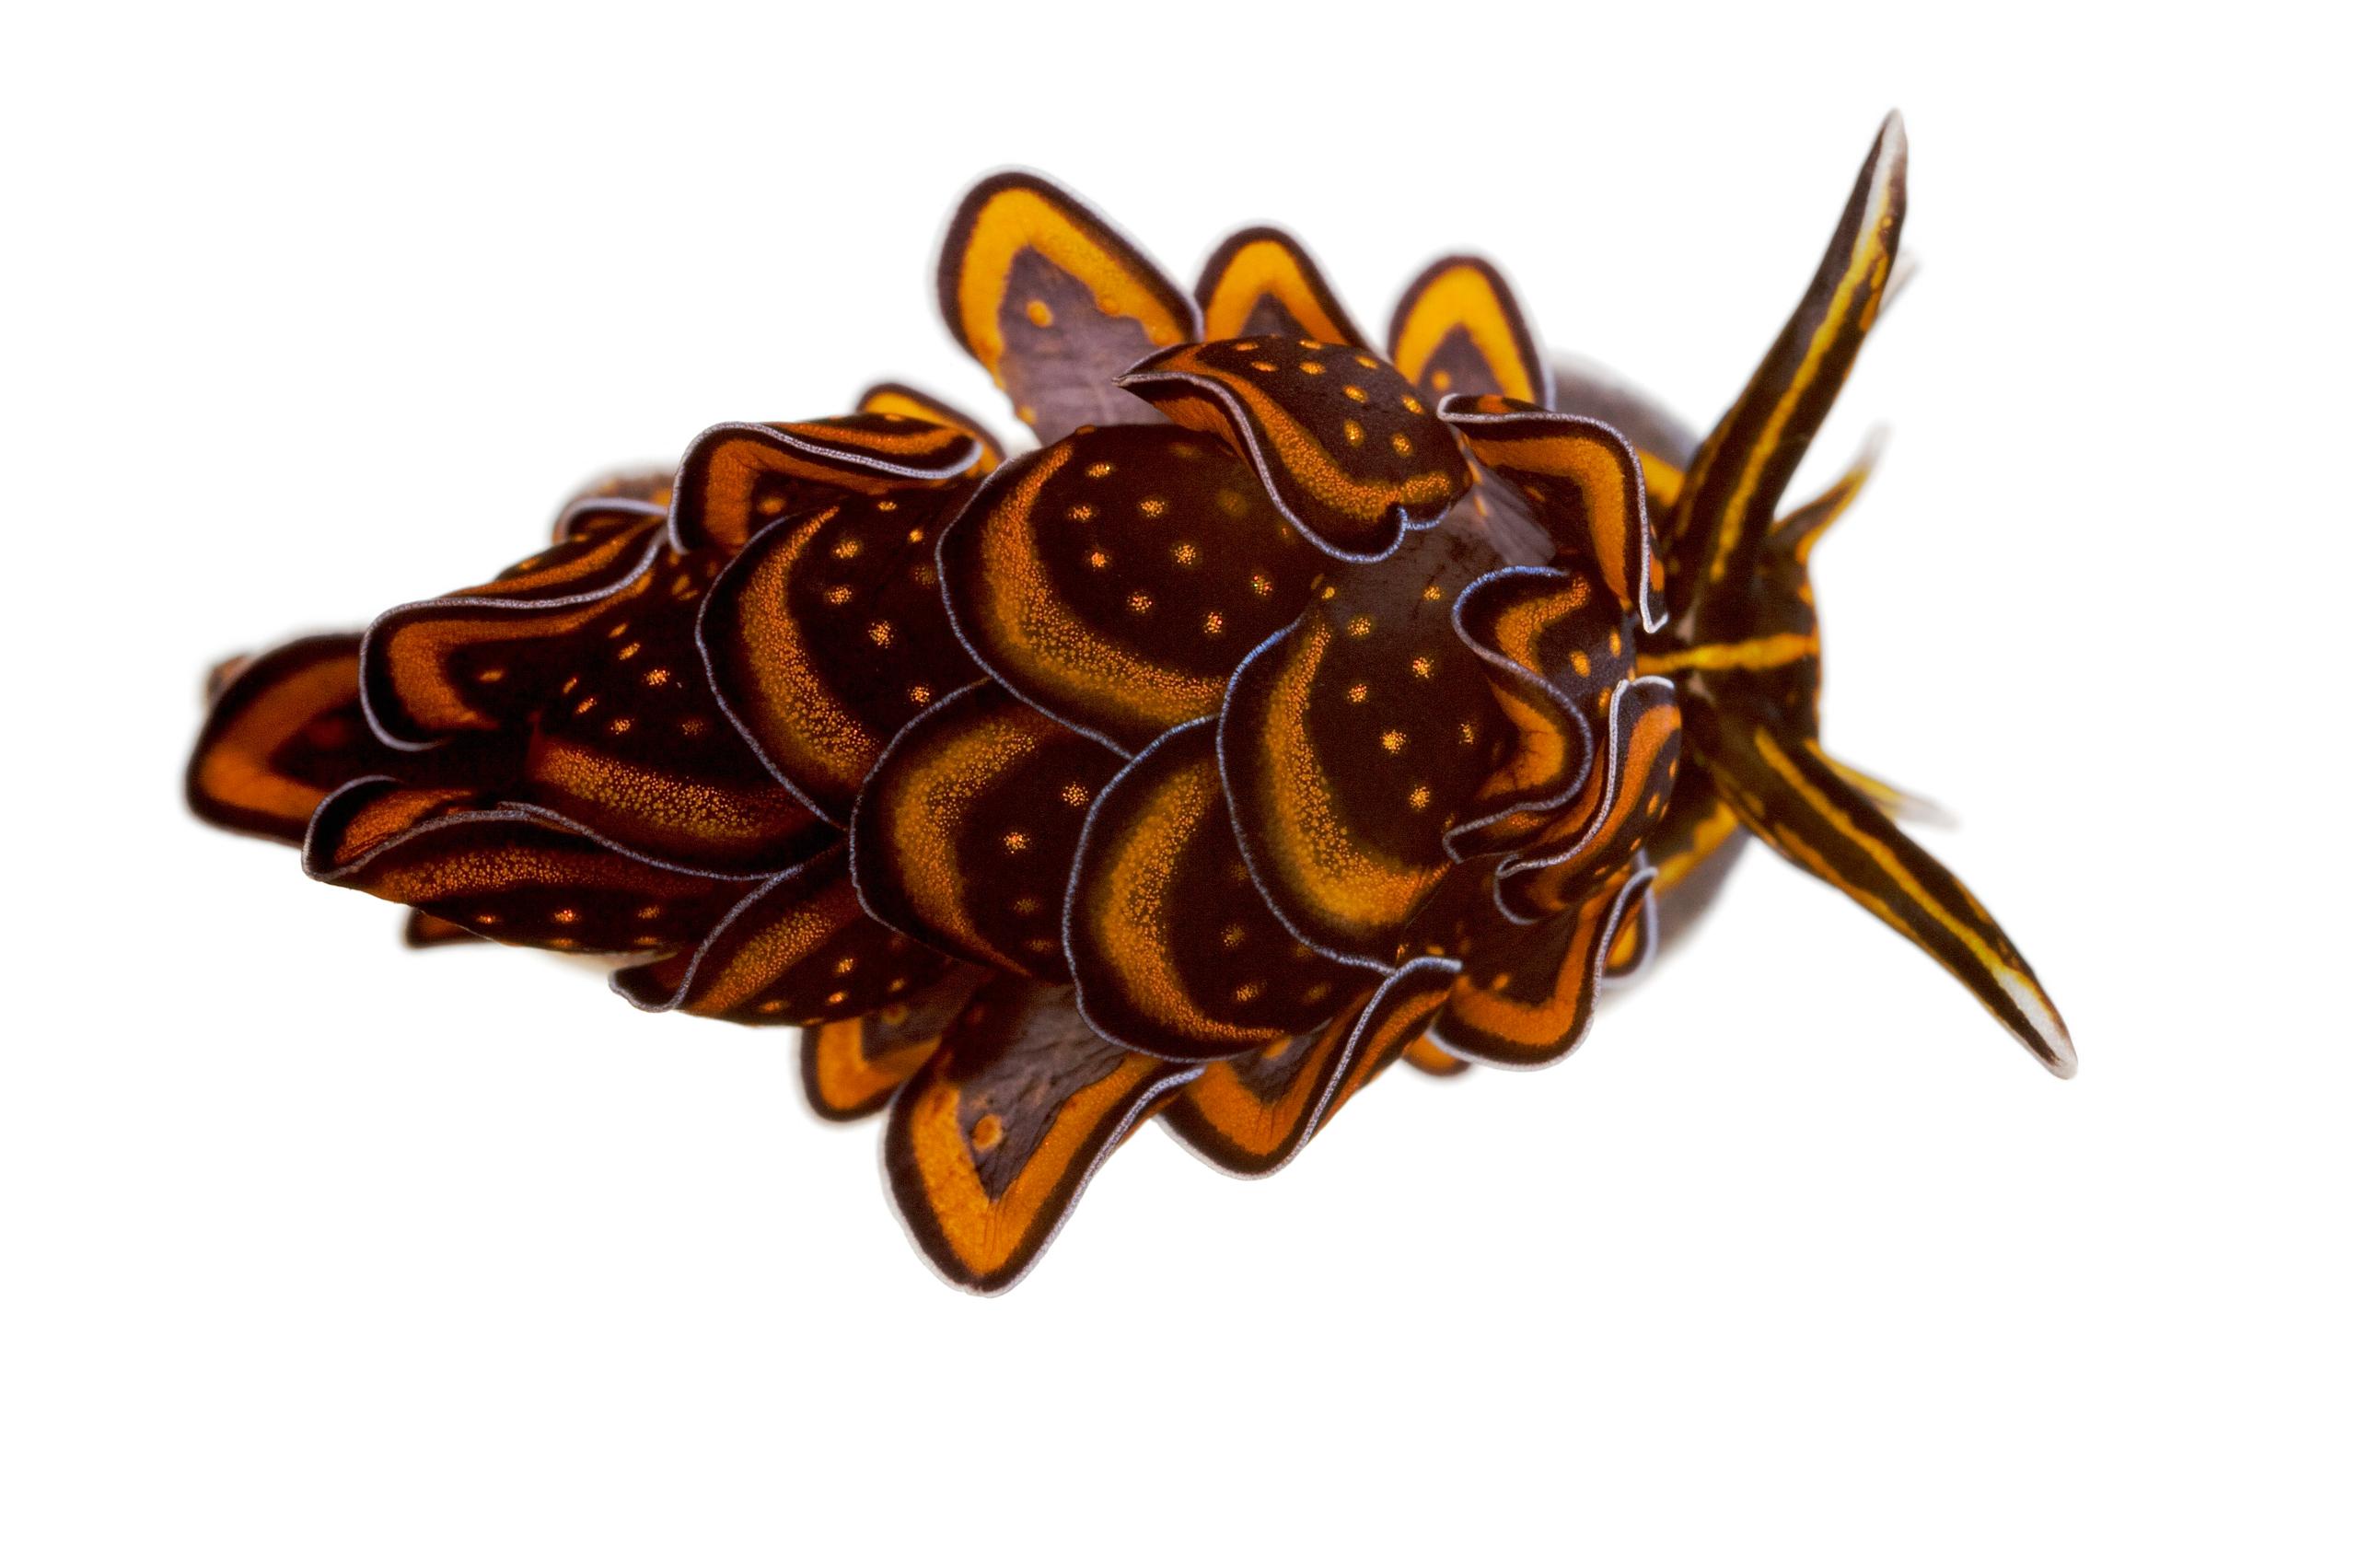 Sacoglossan sea slug, Cyerce nigricans, found at Lighthouse Reef, Moorea, French Polynesia.